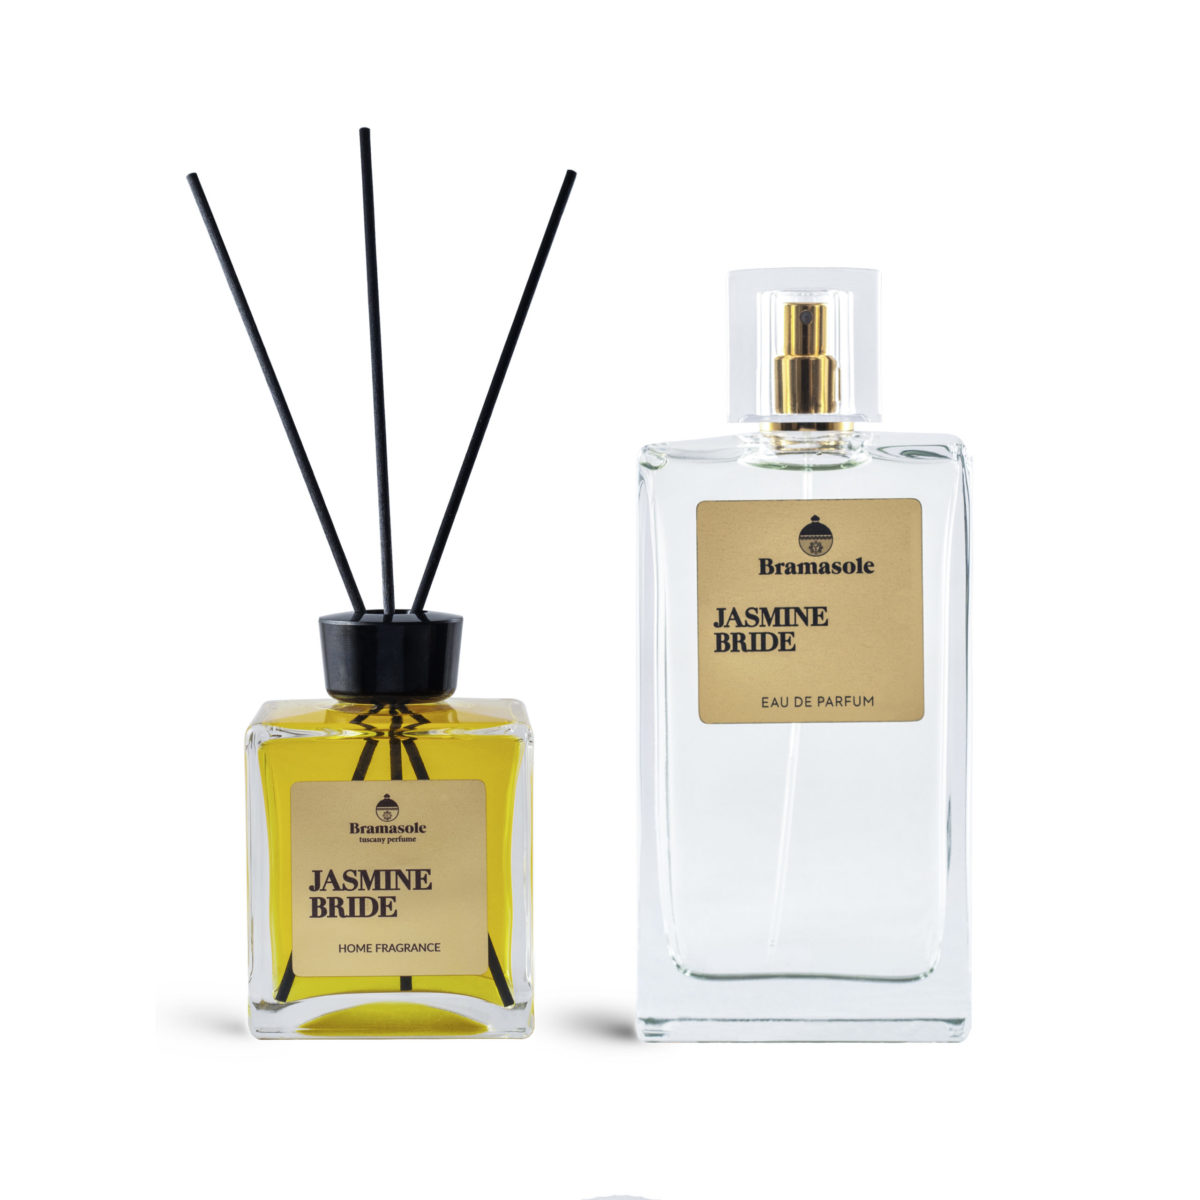 Jasmine Bride Perfume and Home